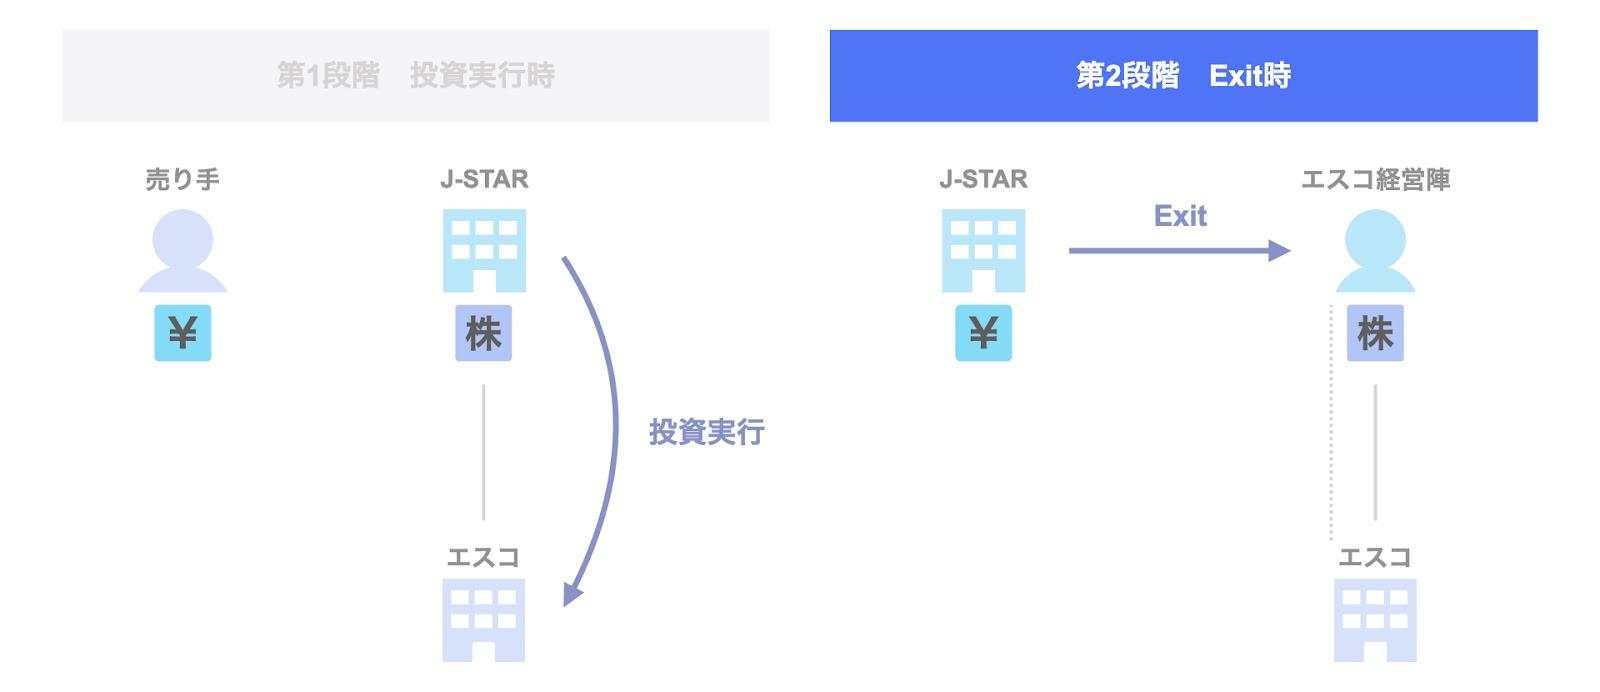 J-STARによるエスコのExit 第2段階:2021年のExit時